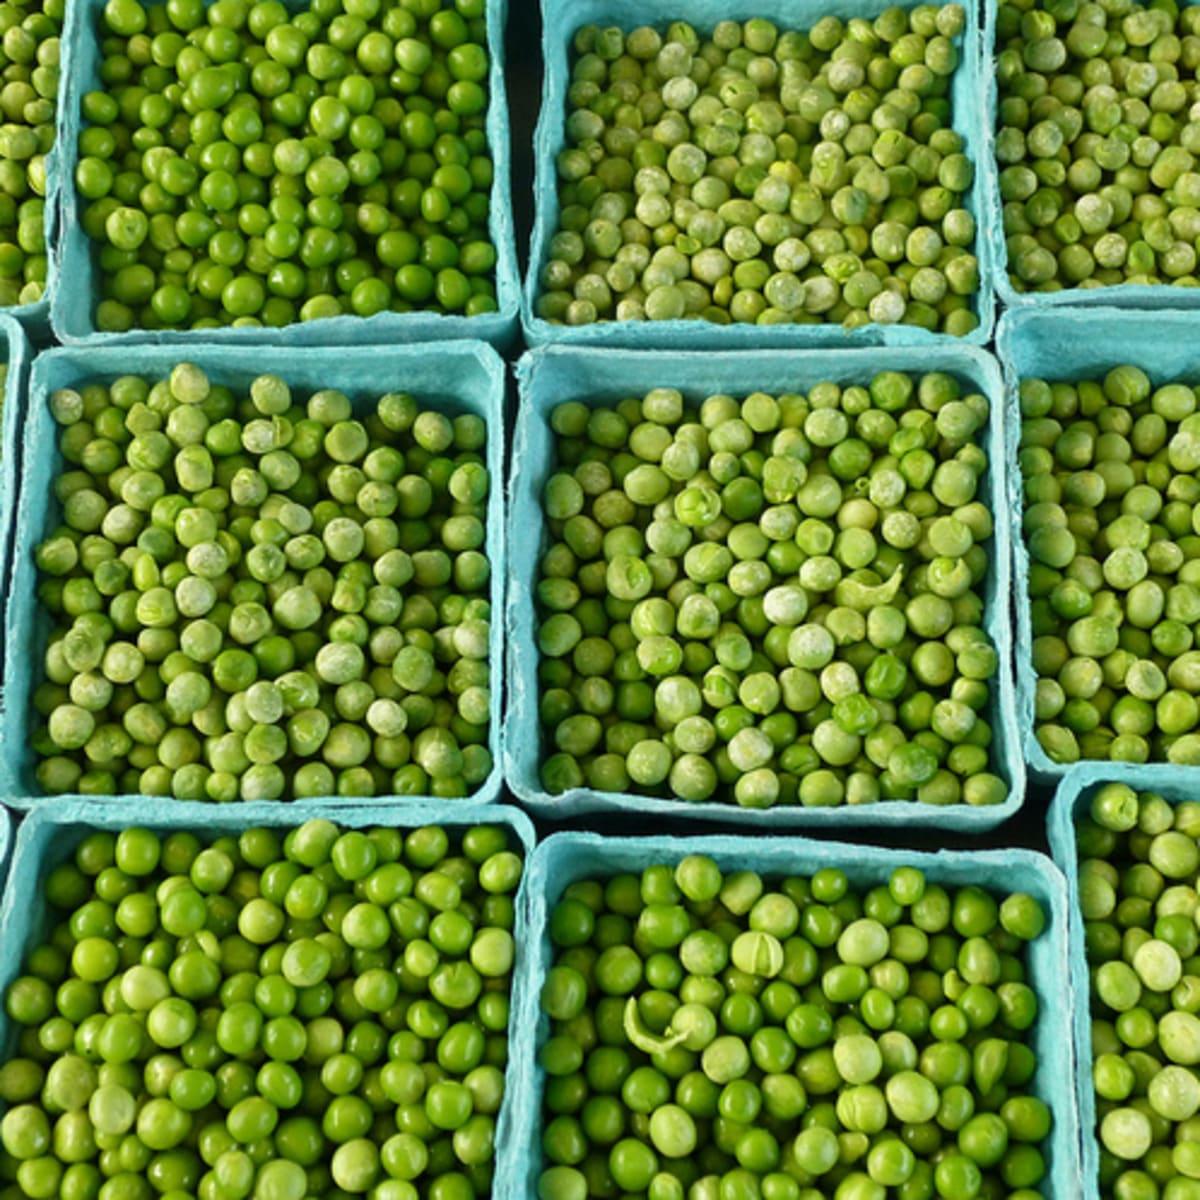 Superfood Focus Spring Green Peas Organic Authority